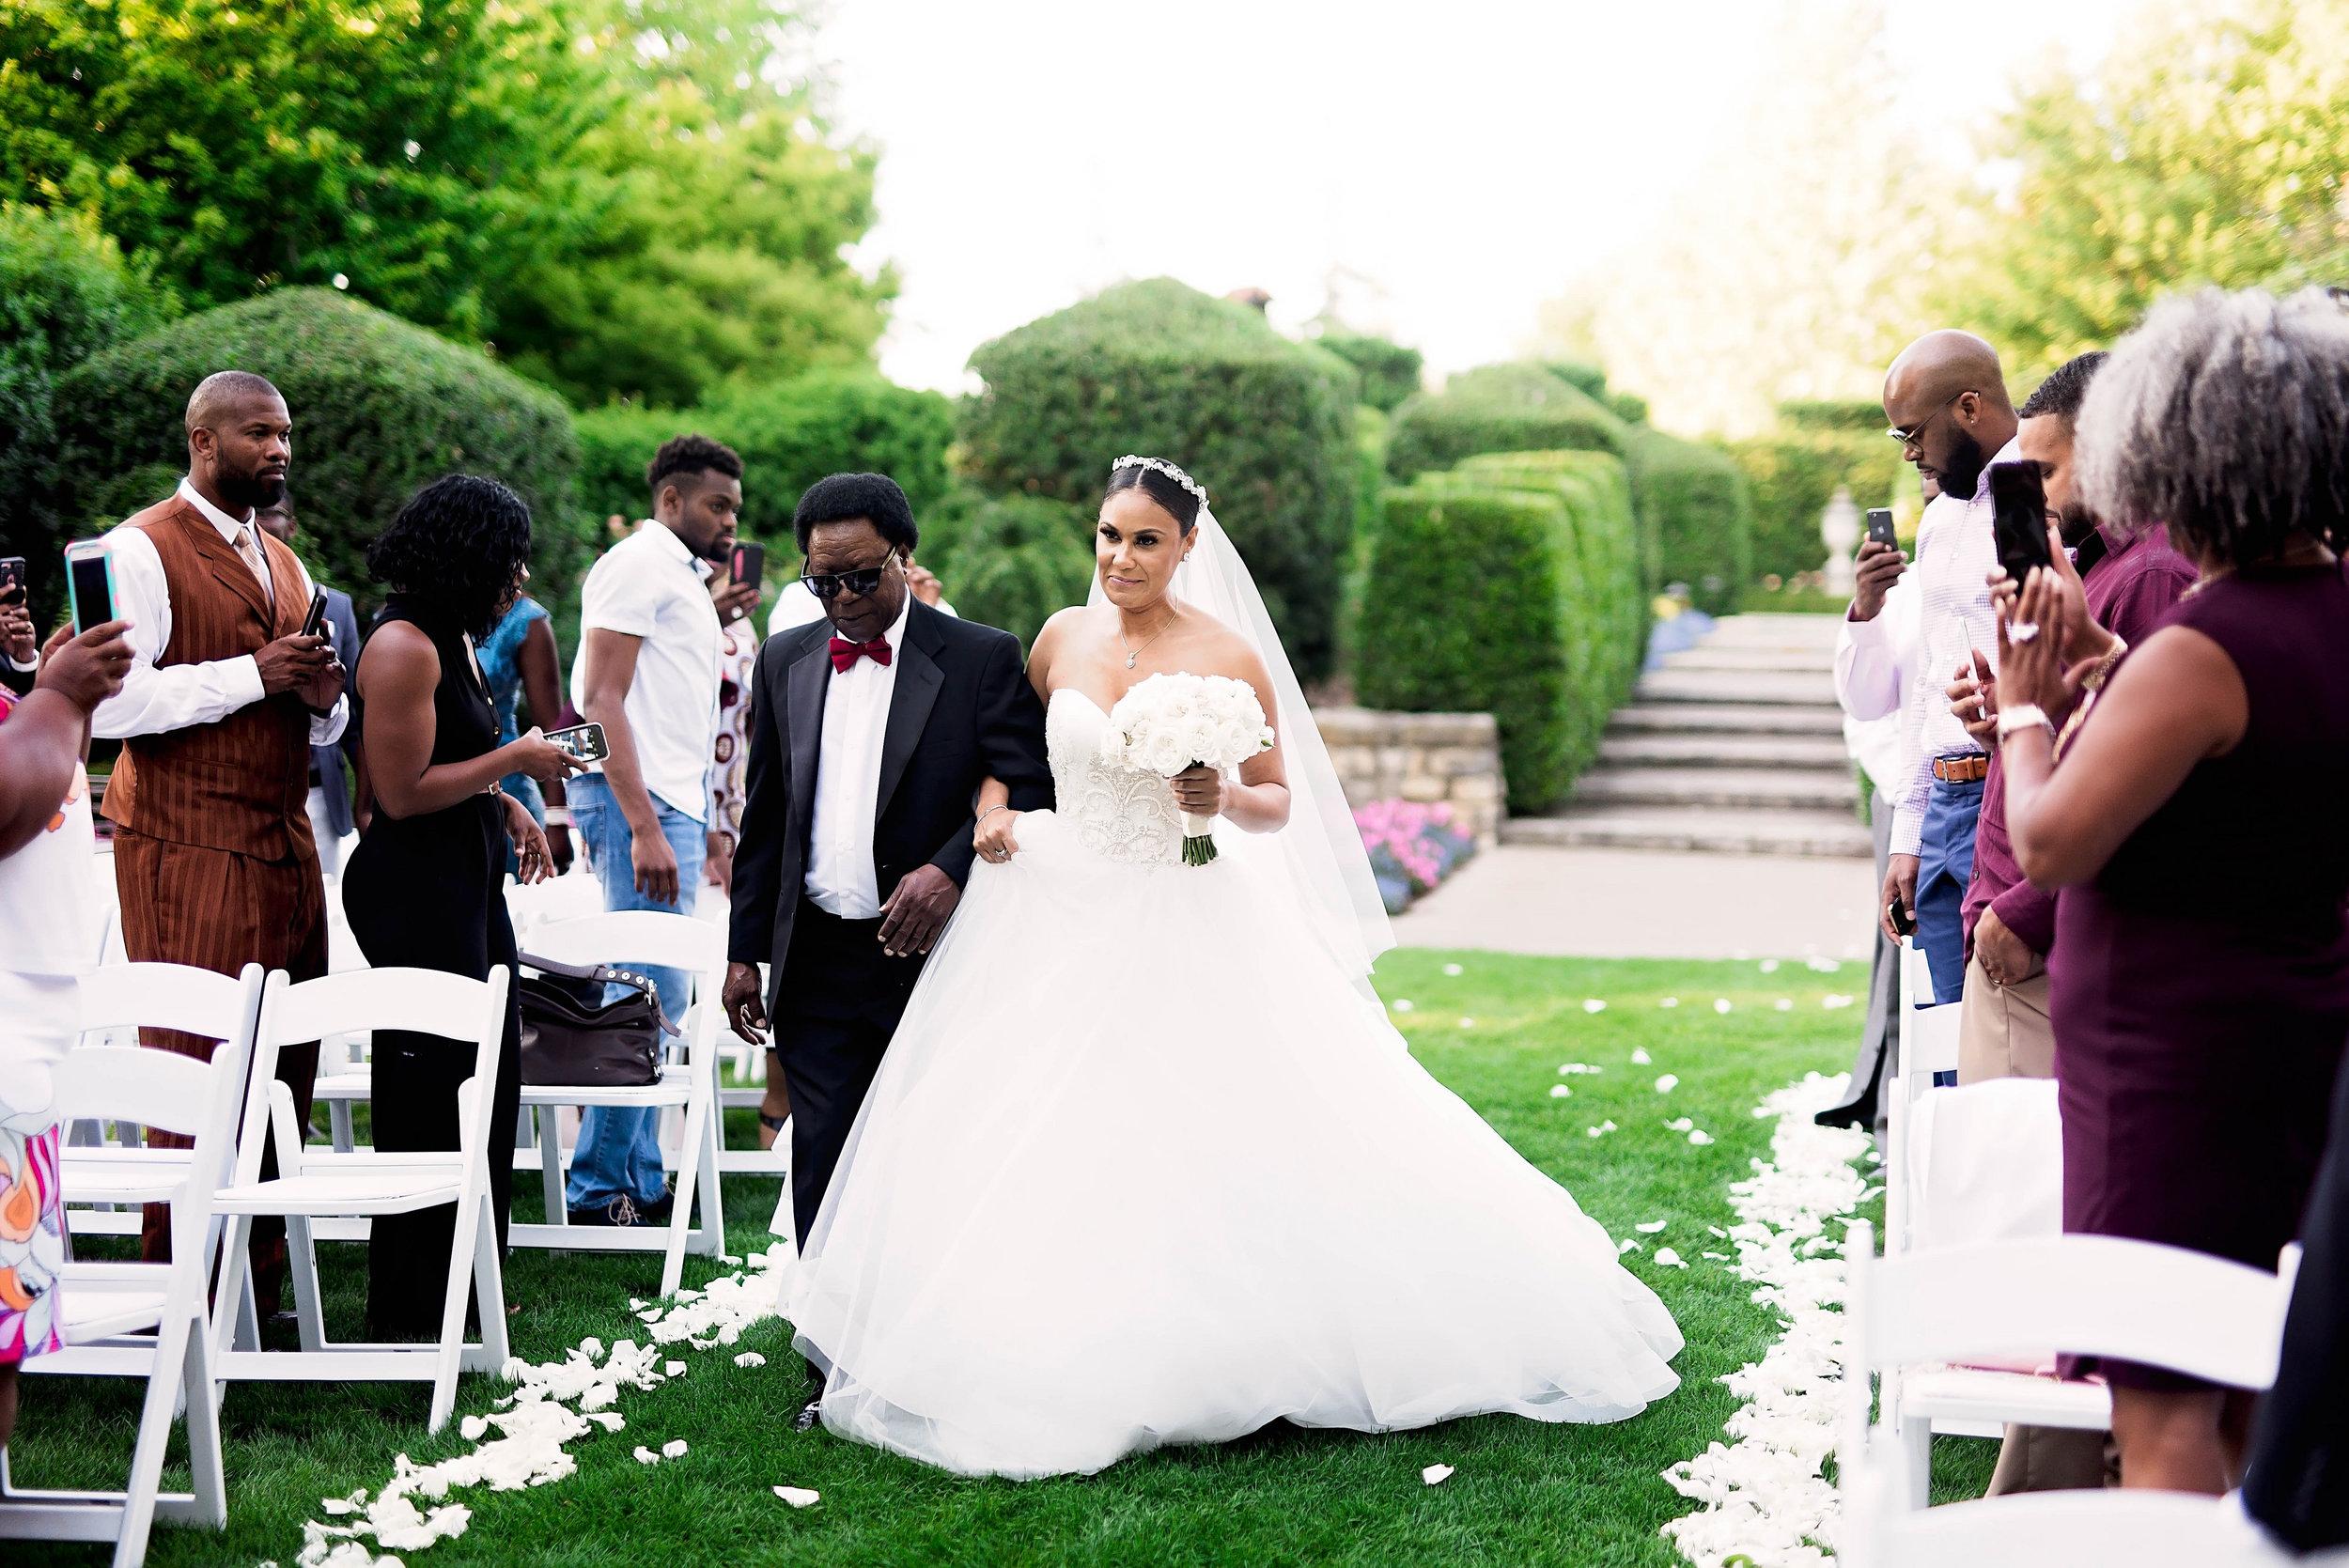 Kerri-Bravion-Wedding-PharrisPhotos-0014.jpg